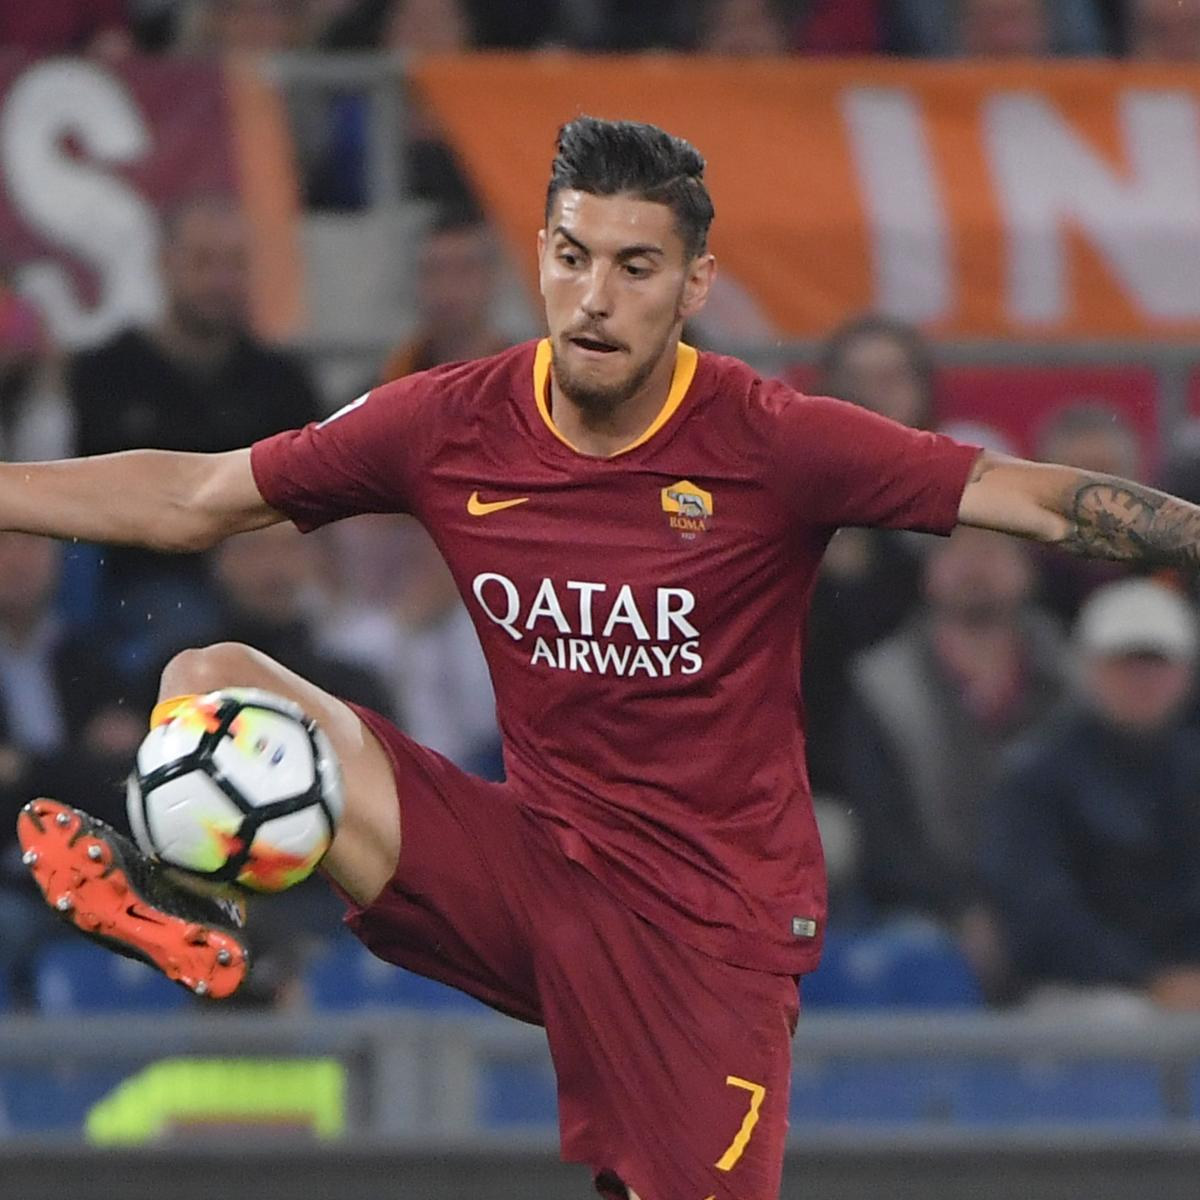 Arsenal Transfer News: Roma's Lorenzo Pellegrini Reportedly Targeted